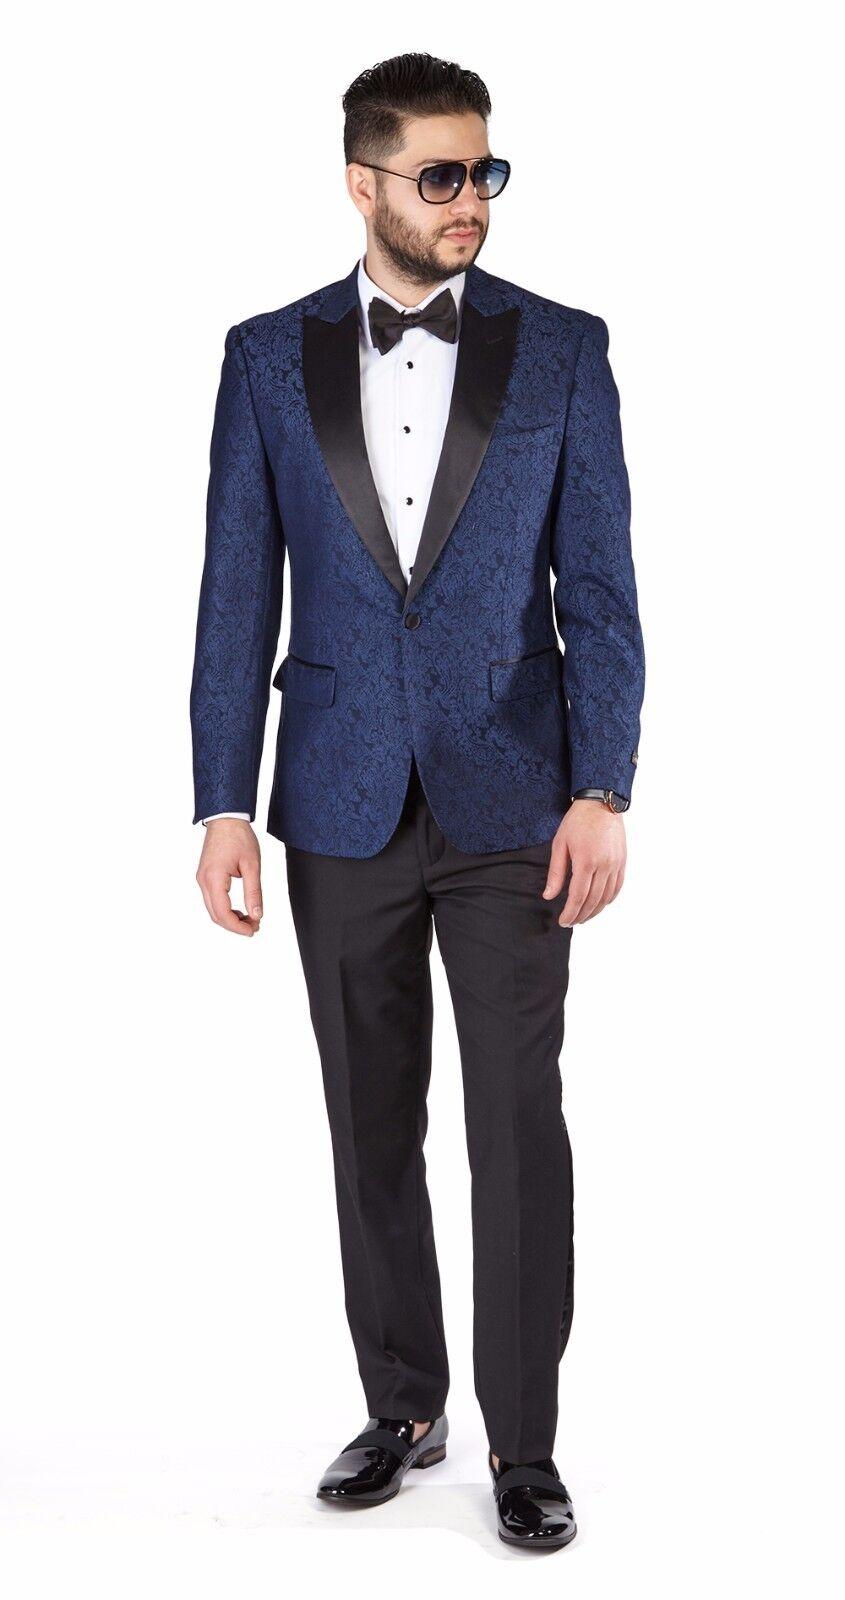 Tuxedo Blue Paisley Peak Lapel Jacket Slim Fit 1 Button Black Pants 1778 AZAR